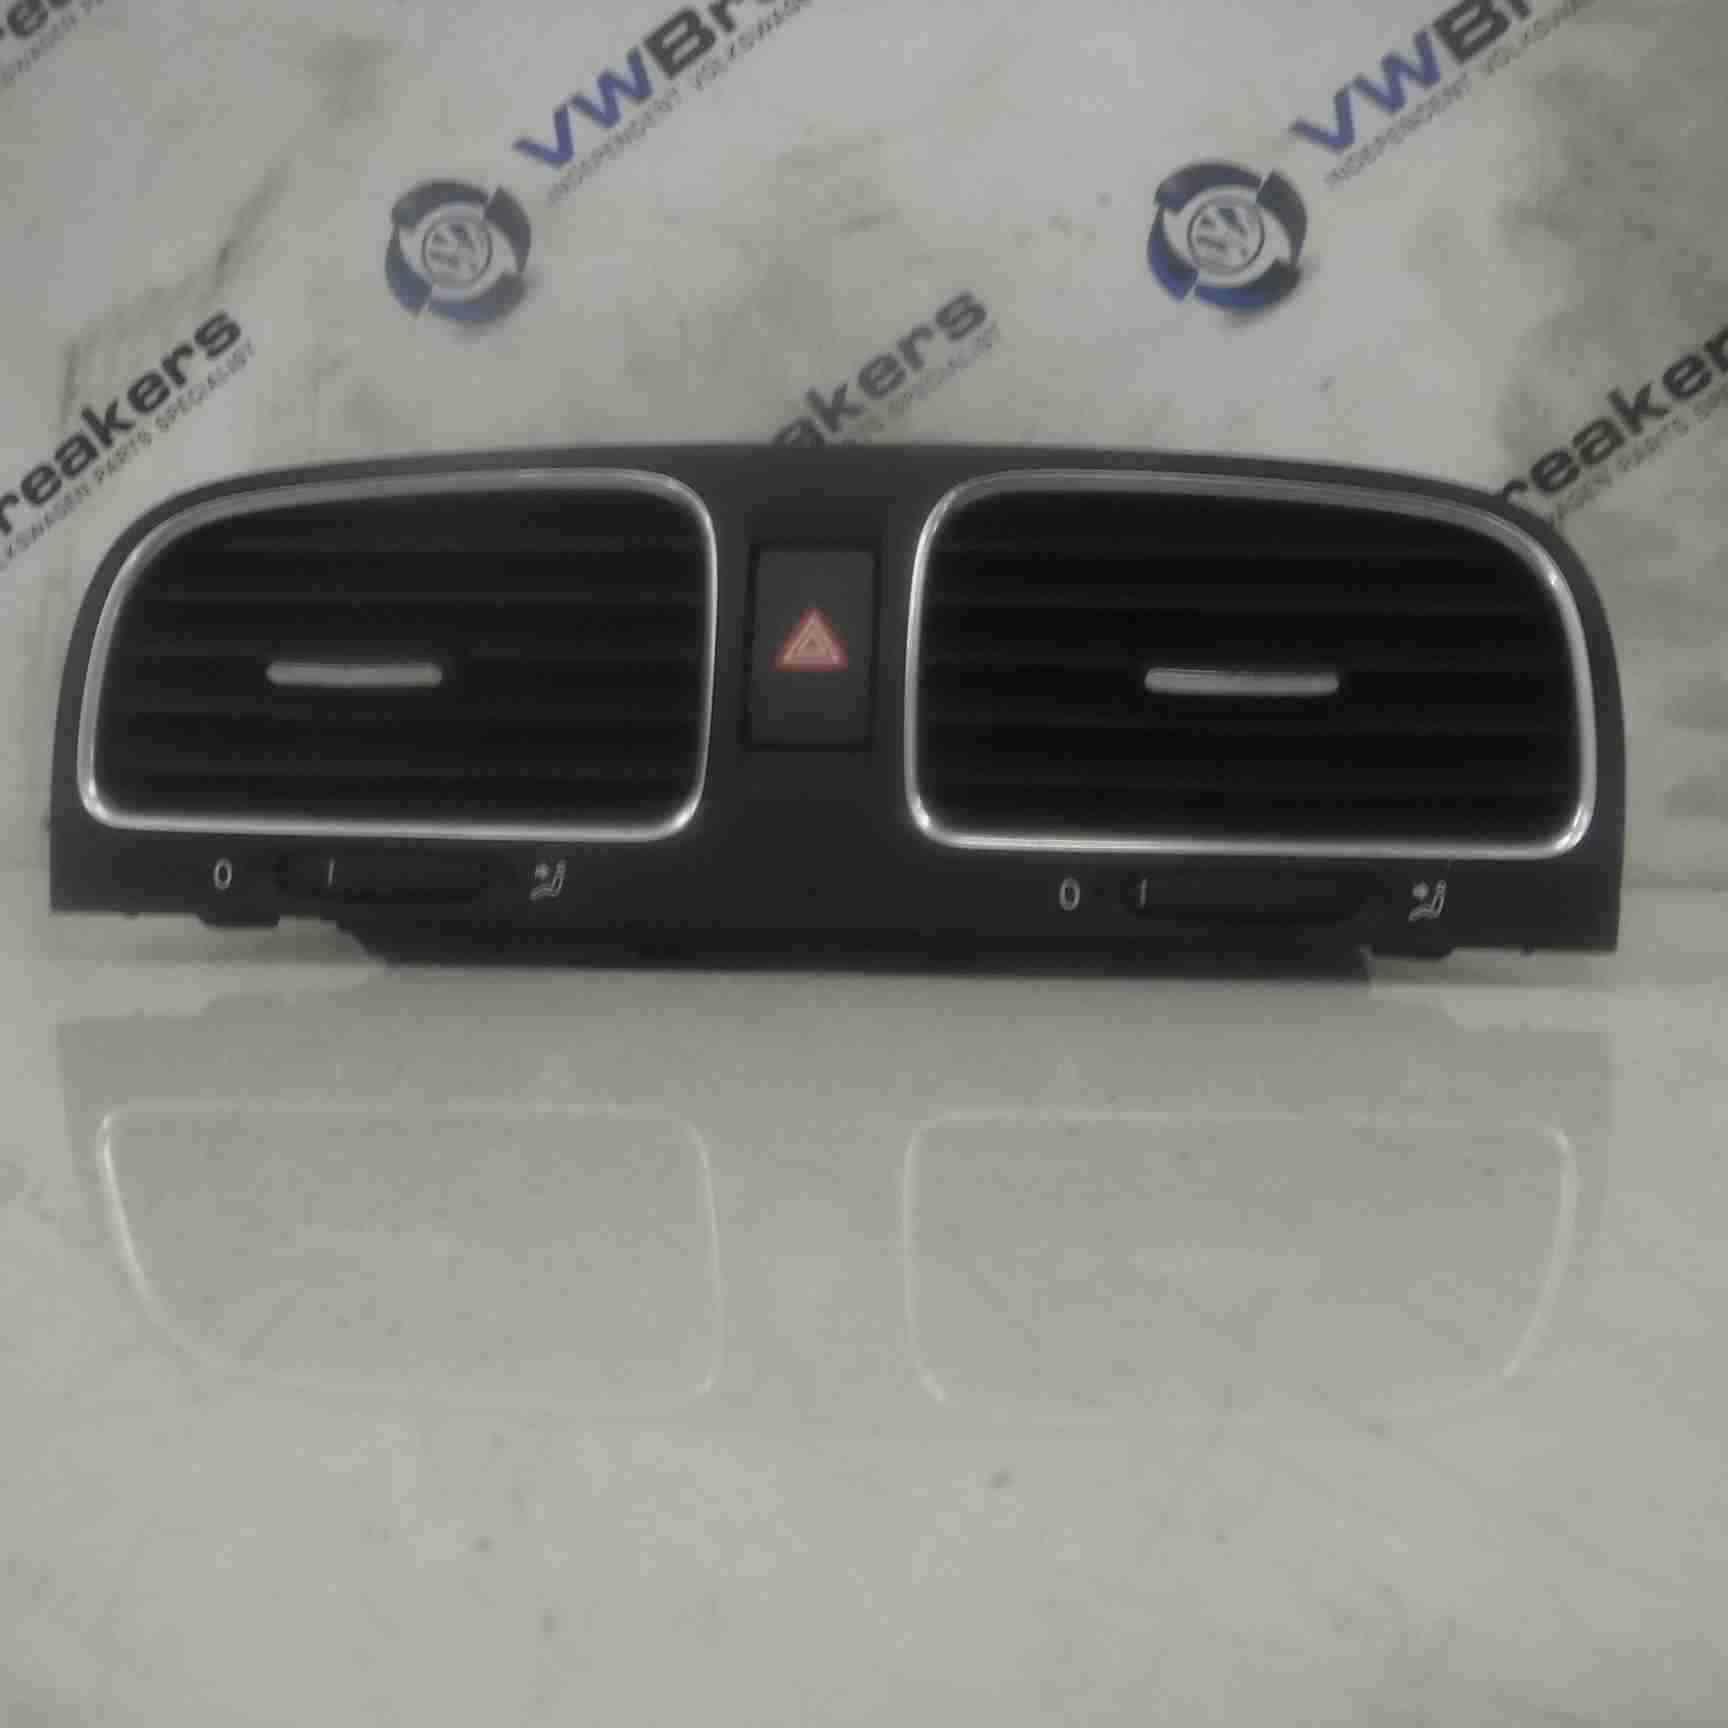 Volkswagen Golf MK6 2009-2012 Centre Heater Vents 5K0815736D 5K0815735D